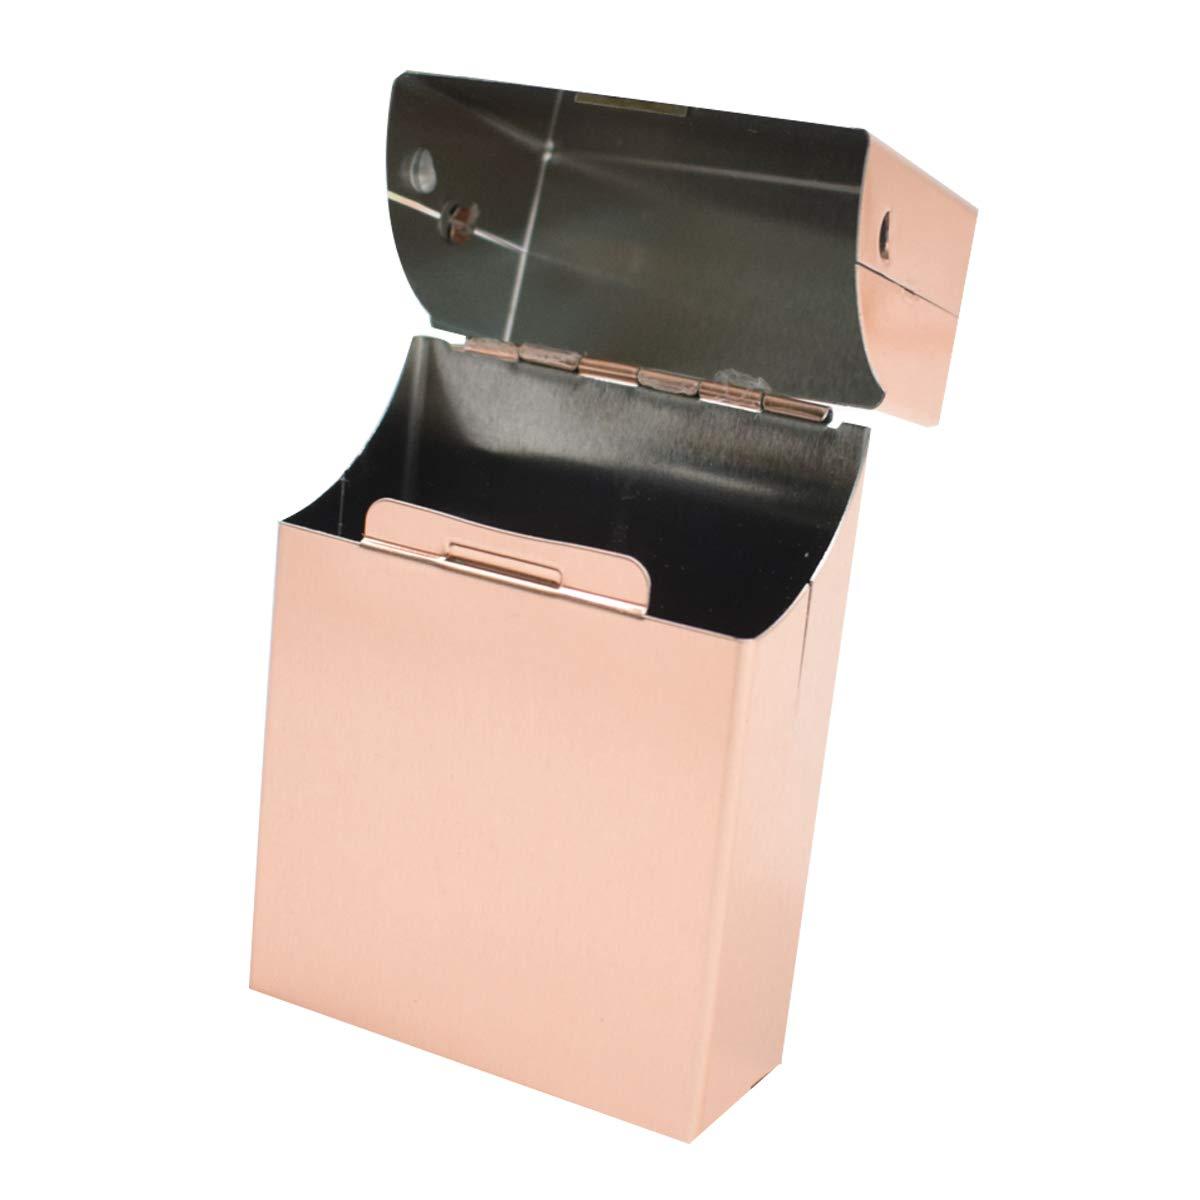 Zigarettenetui 3 Stück Metall Zigarettenkasten für 20 Zigaretten Zigarettenbox